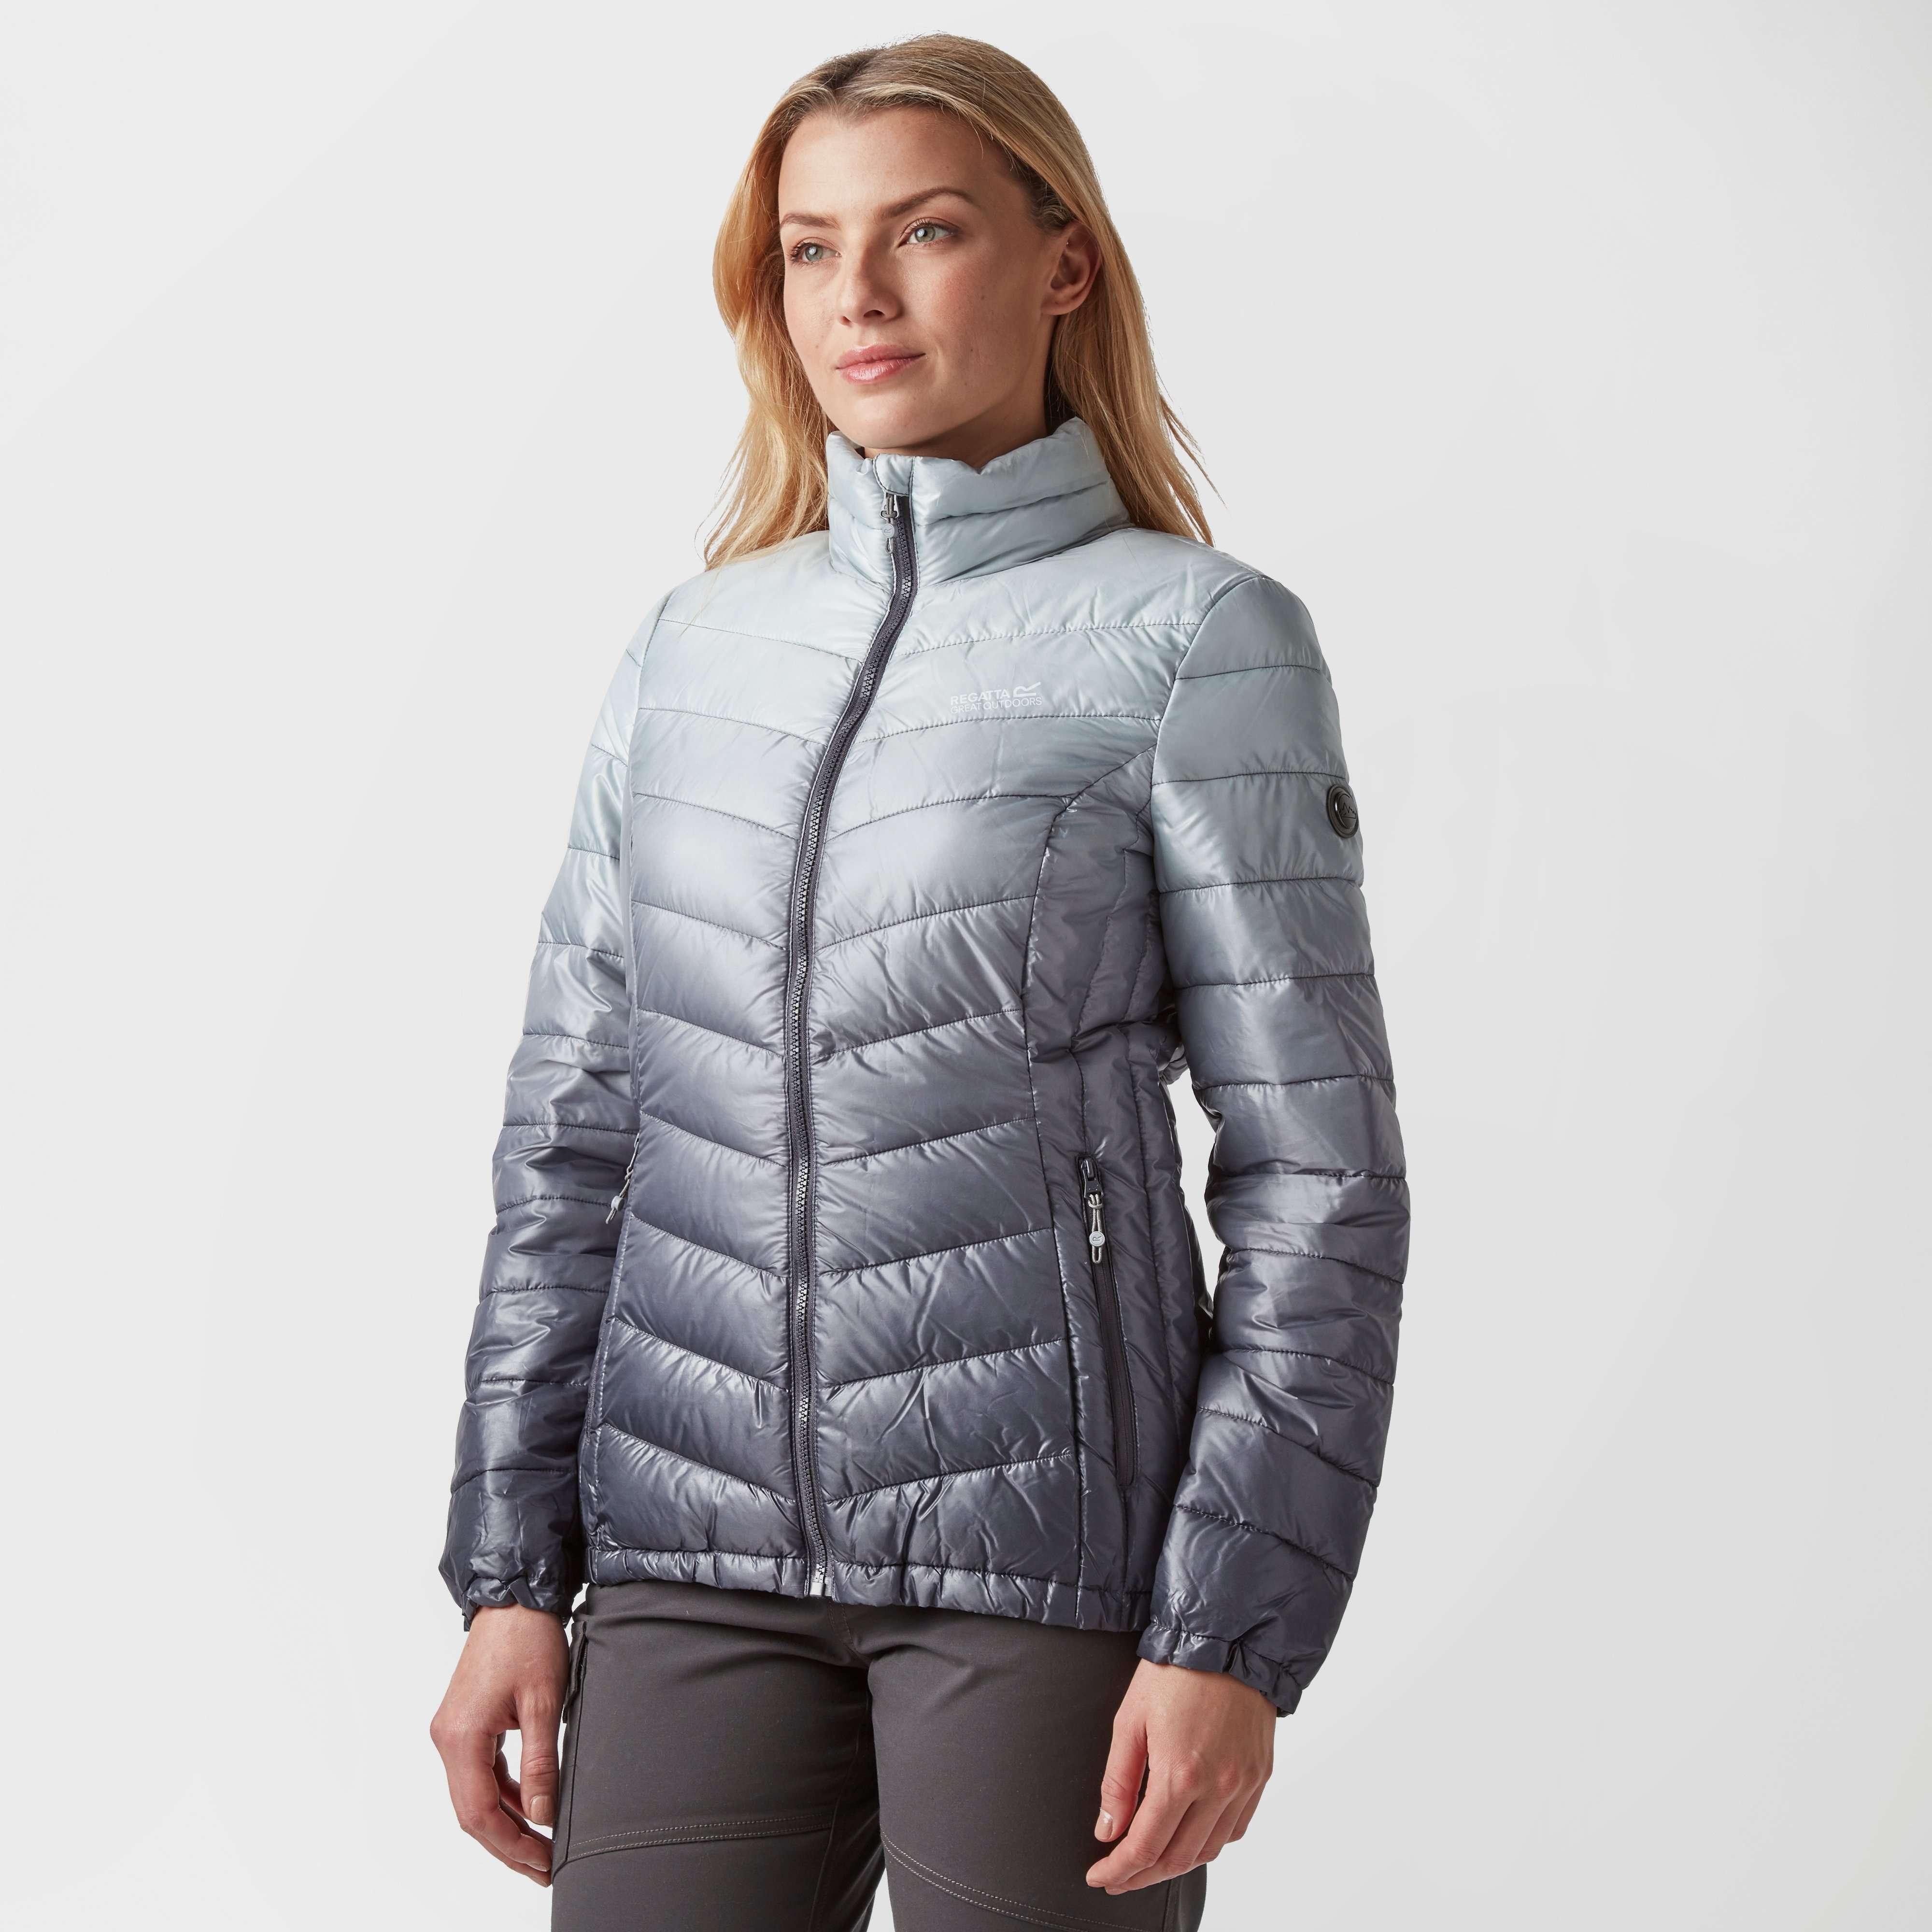 REGATTA Women's Azume Atomlight Insulated Jacket